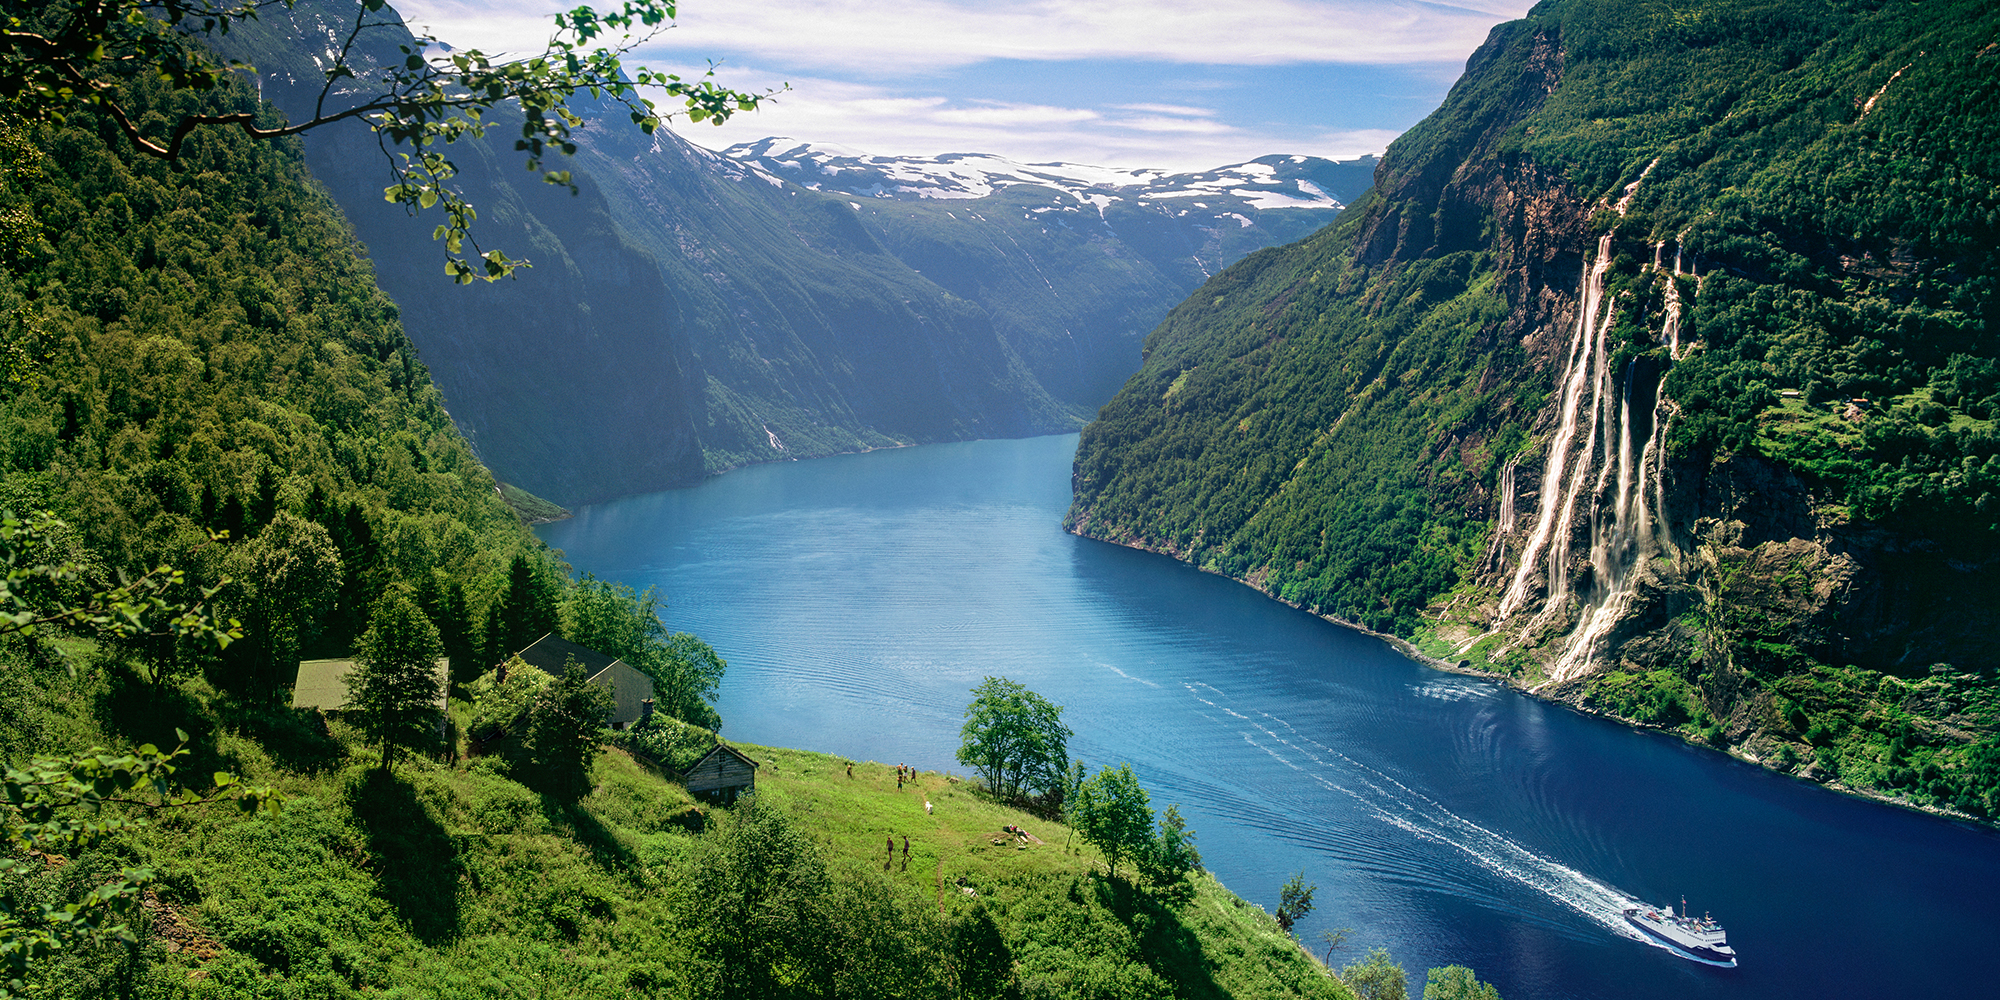 La terra dei fiordi